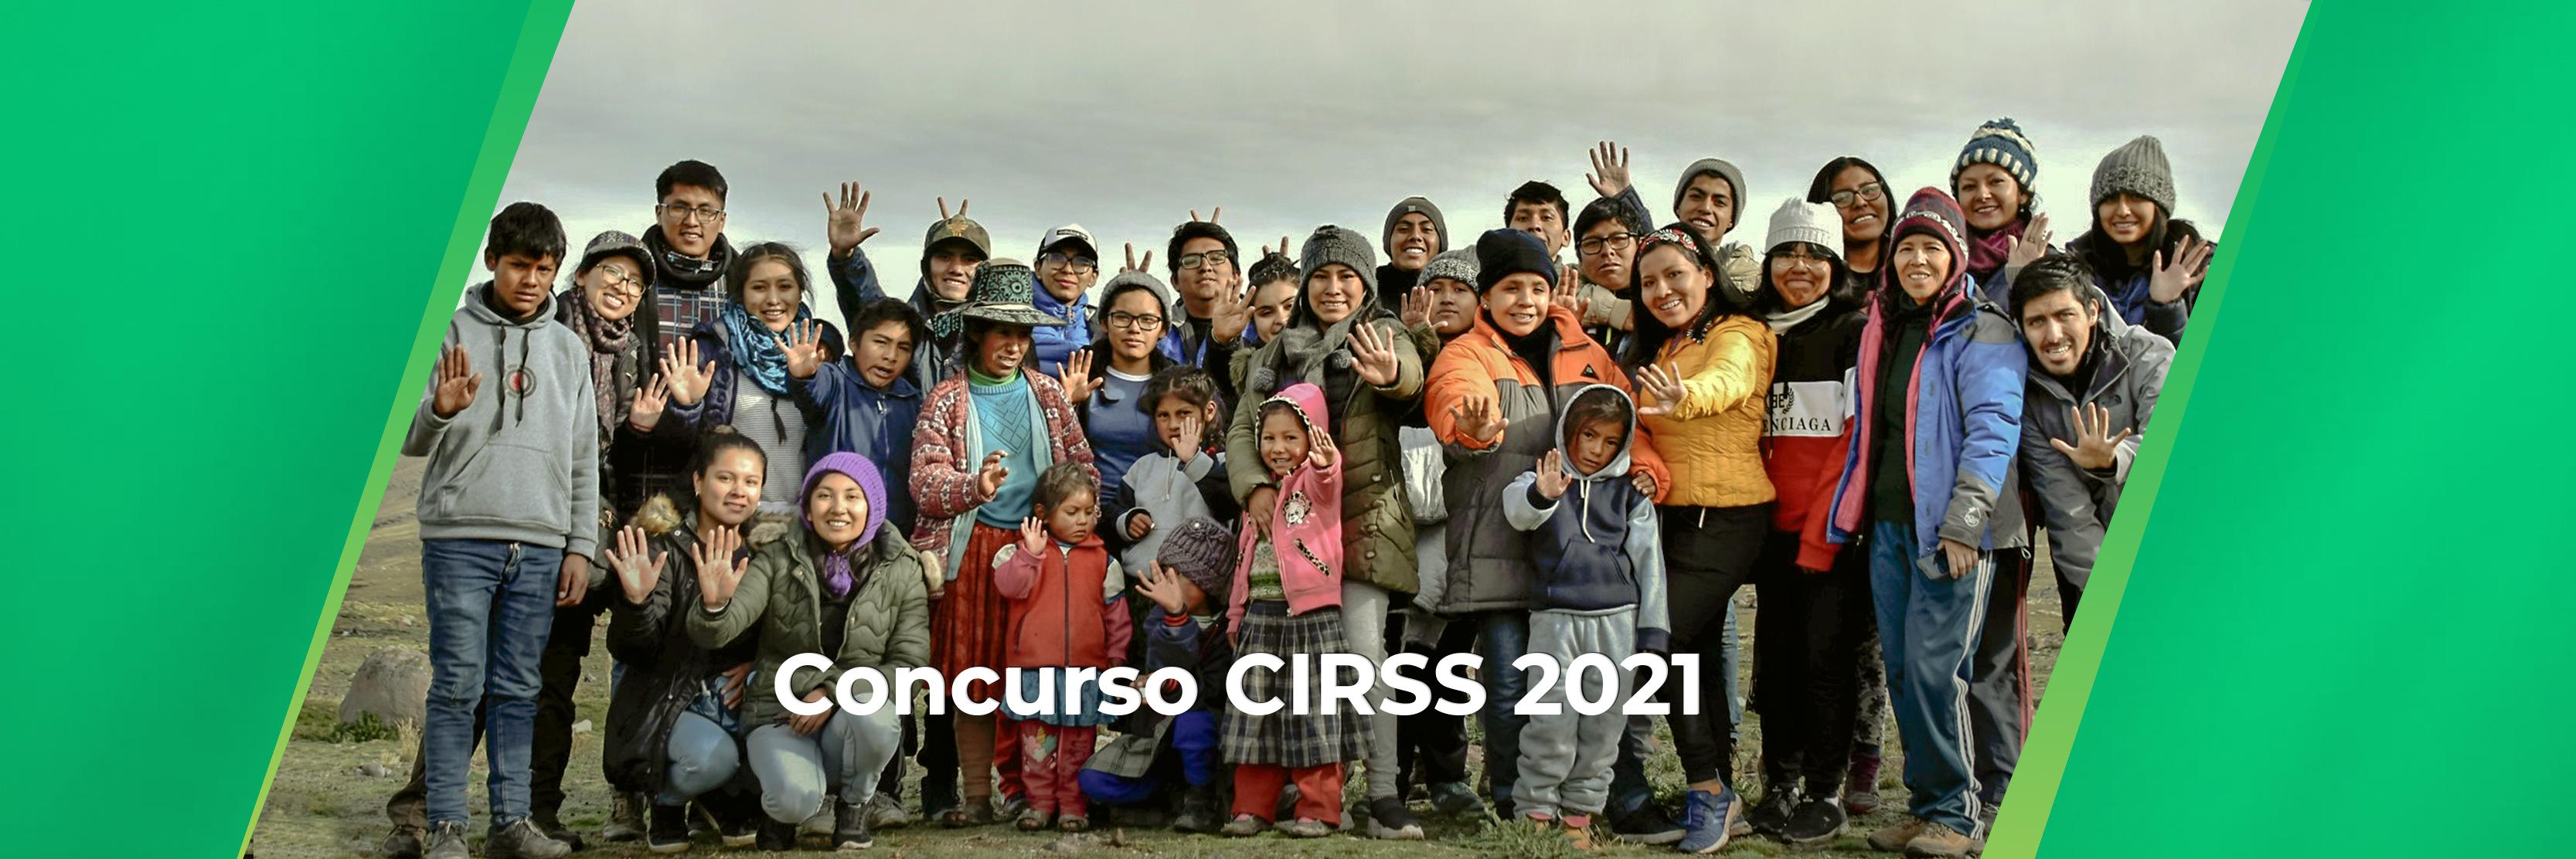 concurso-cirss-2021